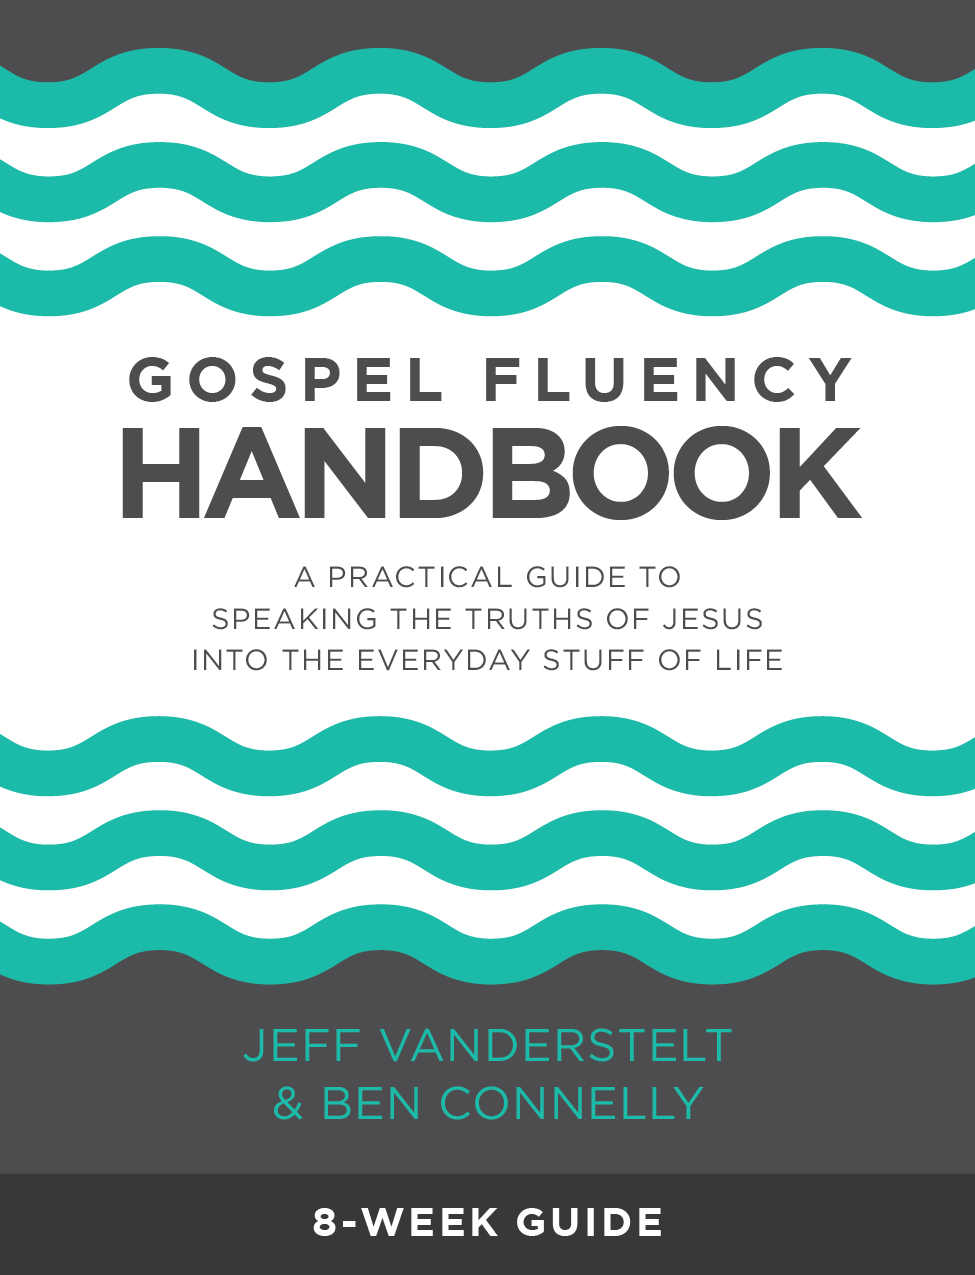 Gospel Fluency Handbook Bulk Orders